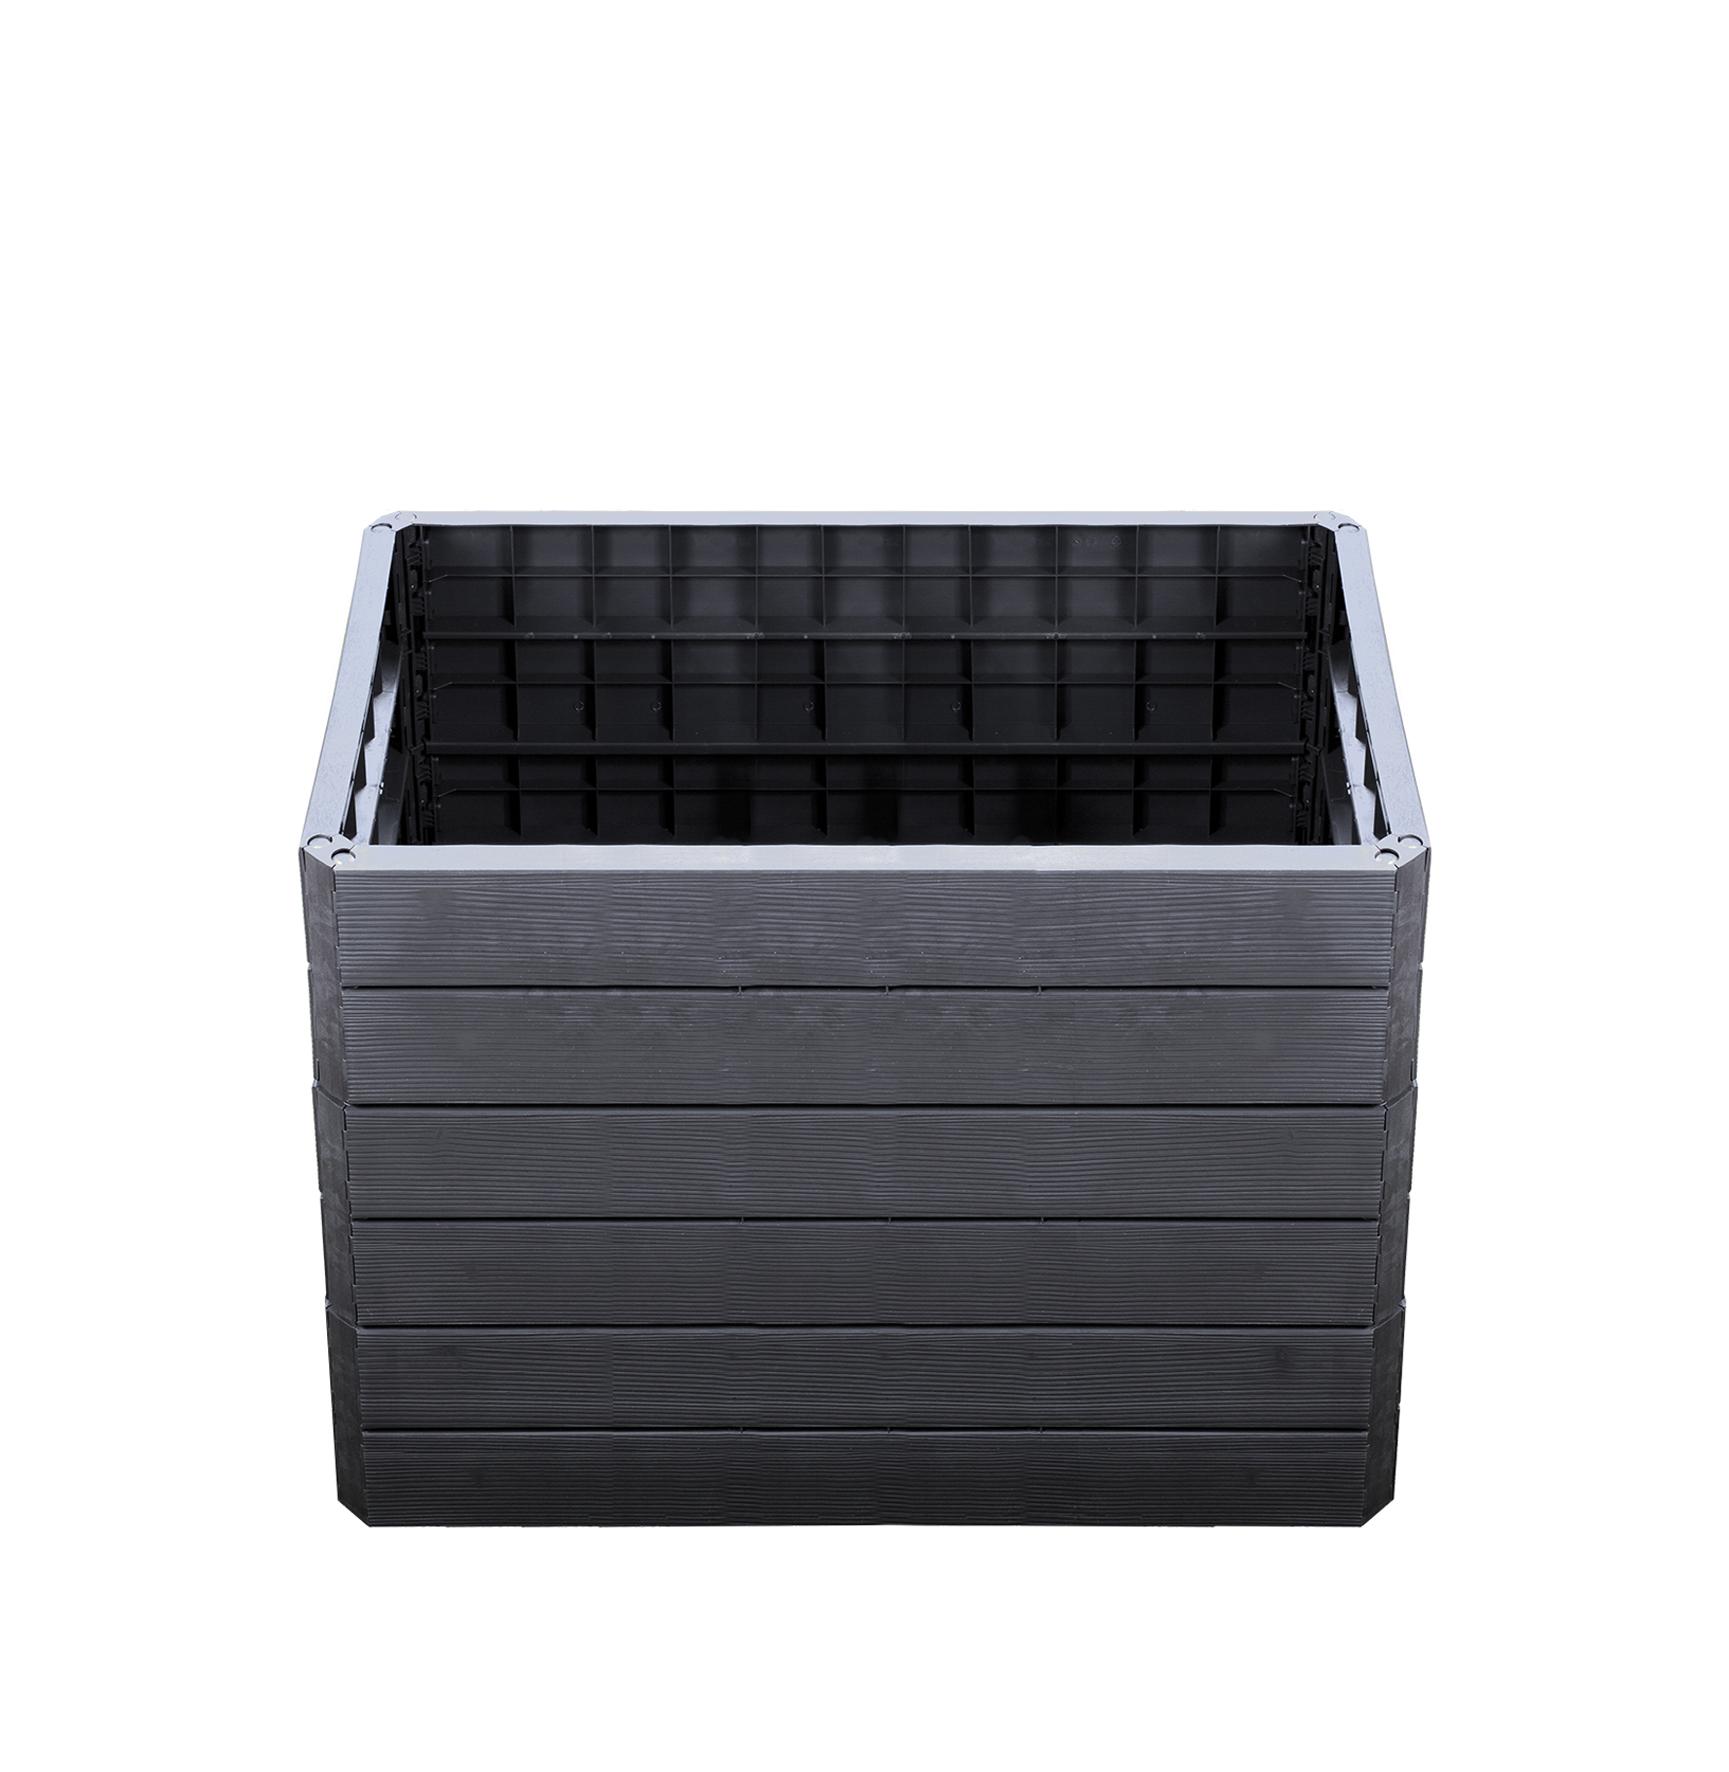 Ergo Hochbeet System Quadro M Set 60x80x25cm GARANTIA Bild 4